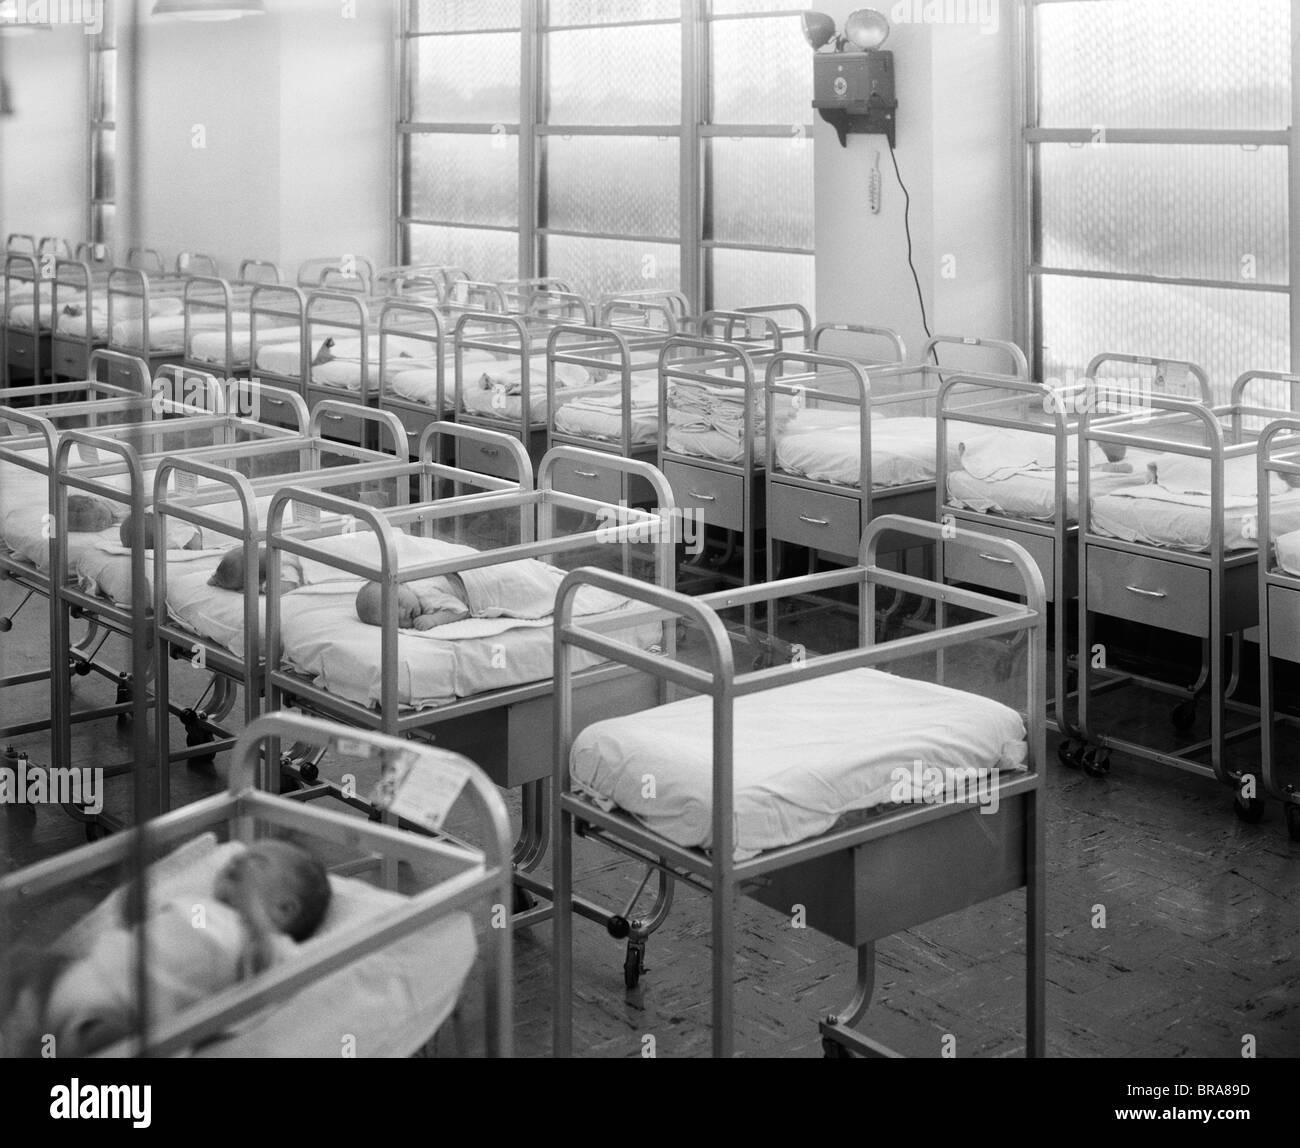 1950s 1960s Babies In Hospital Nursery Cribs Stock Photo